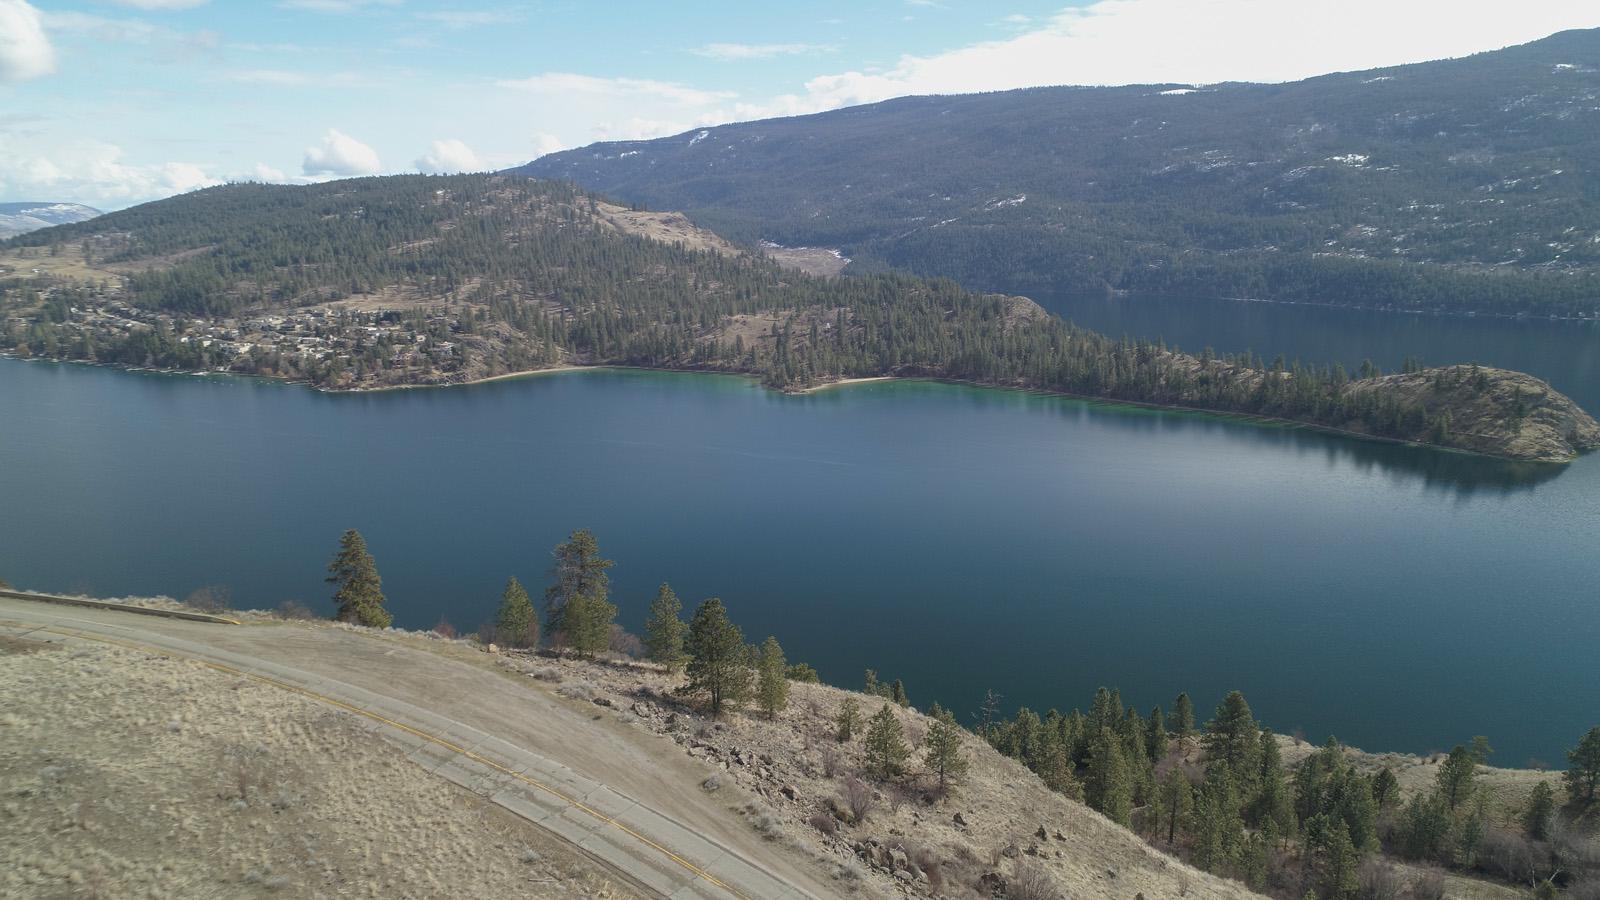 Kalamalka lake veiw 202 03